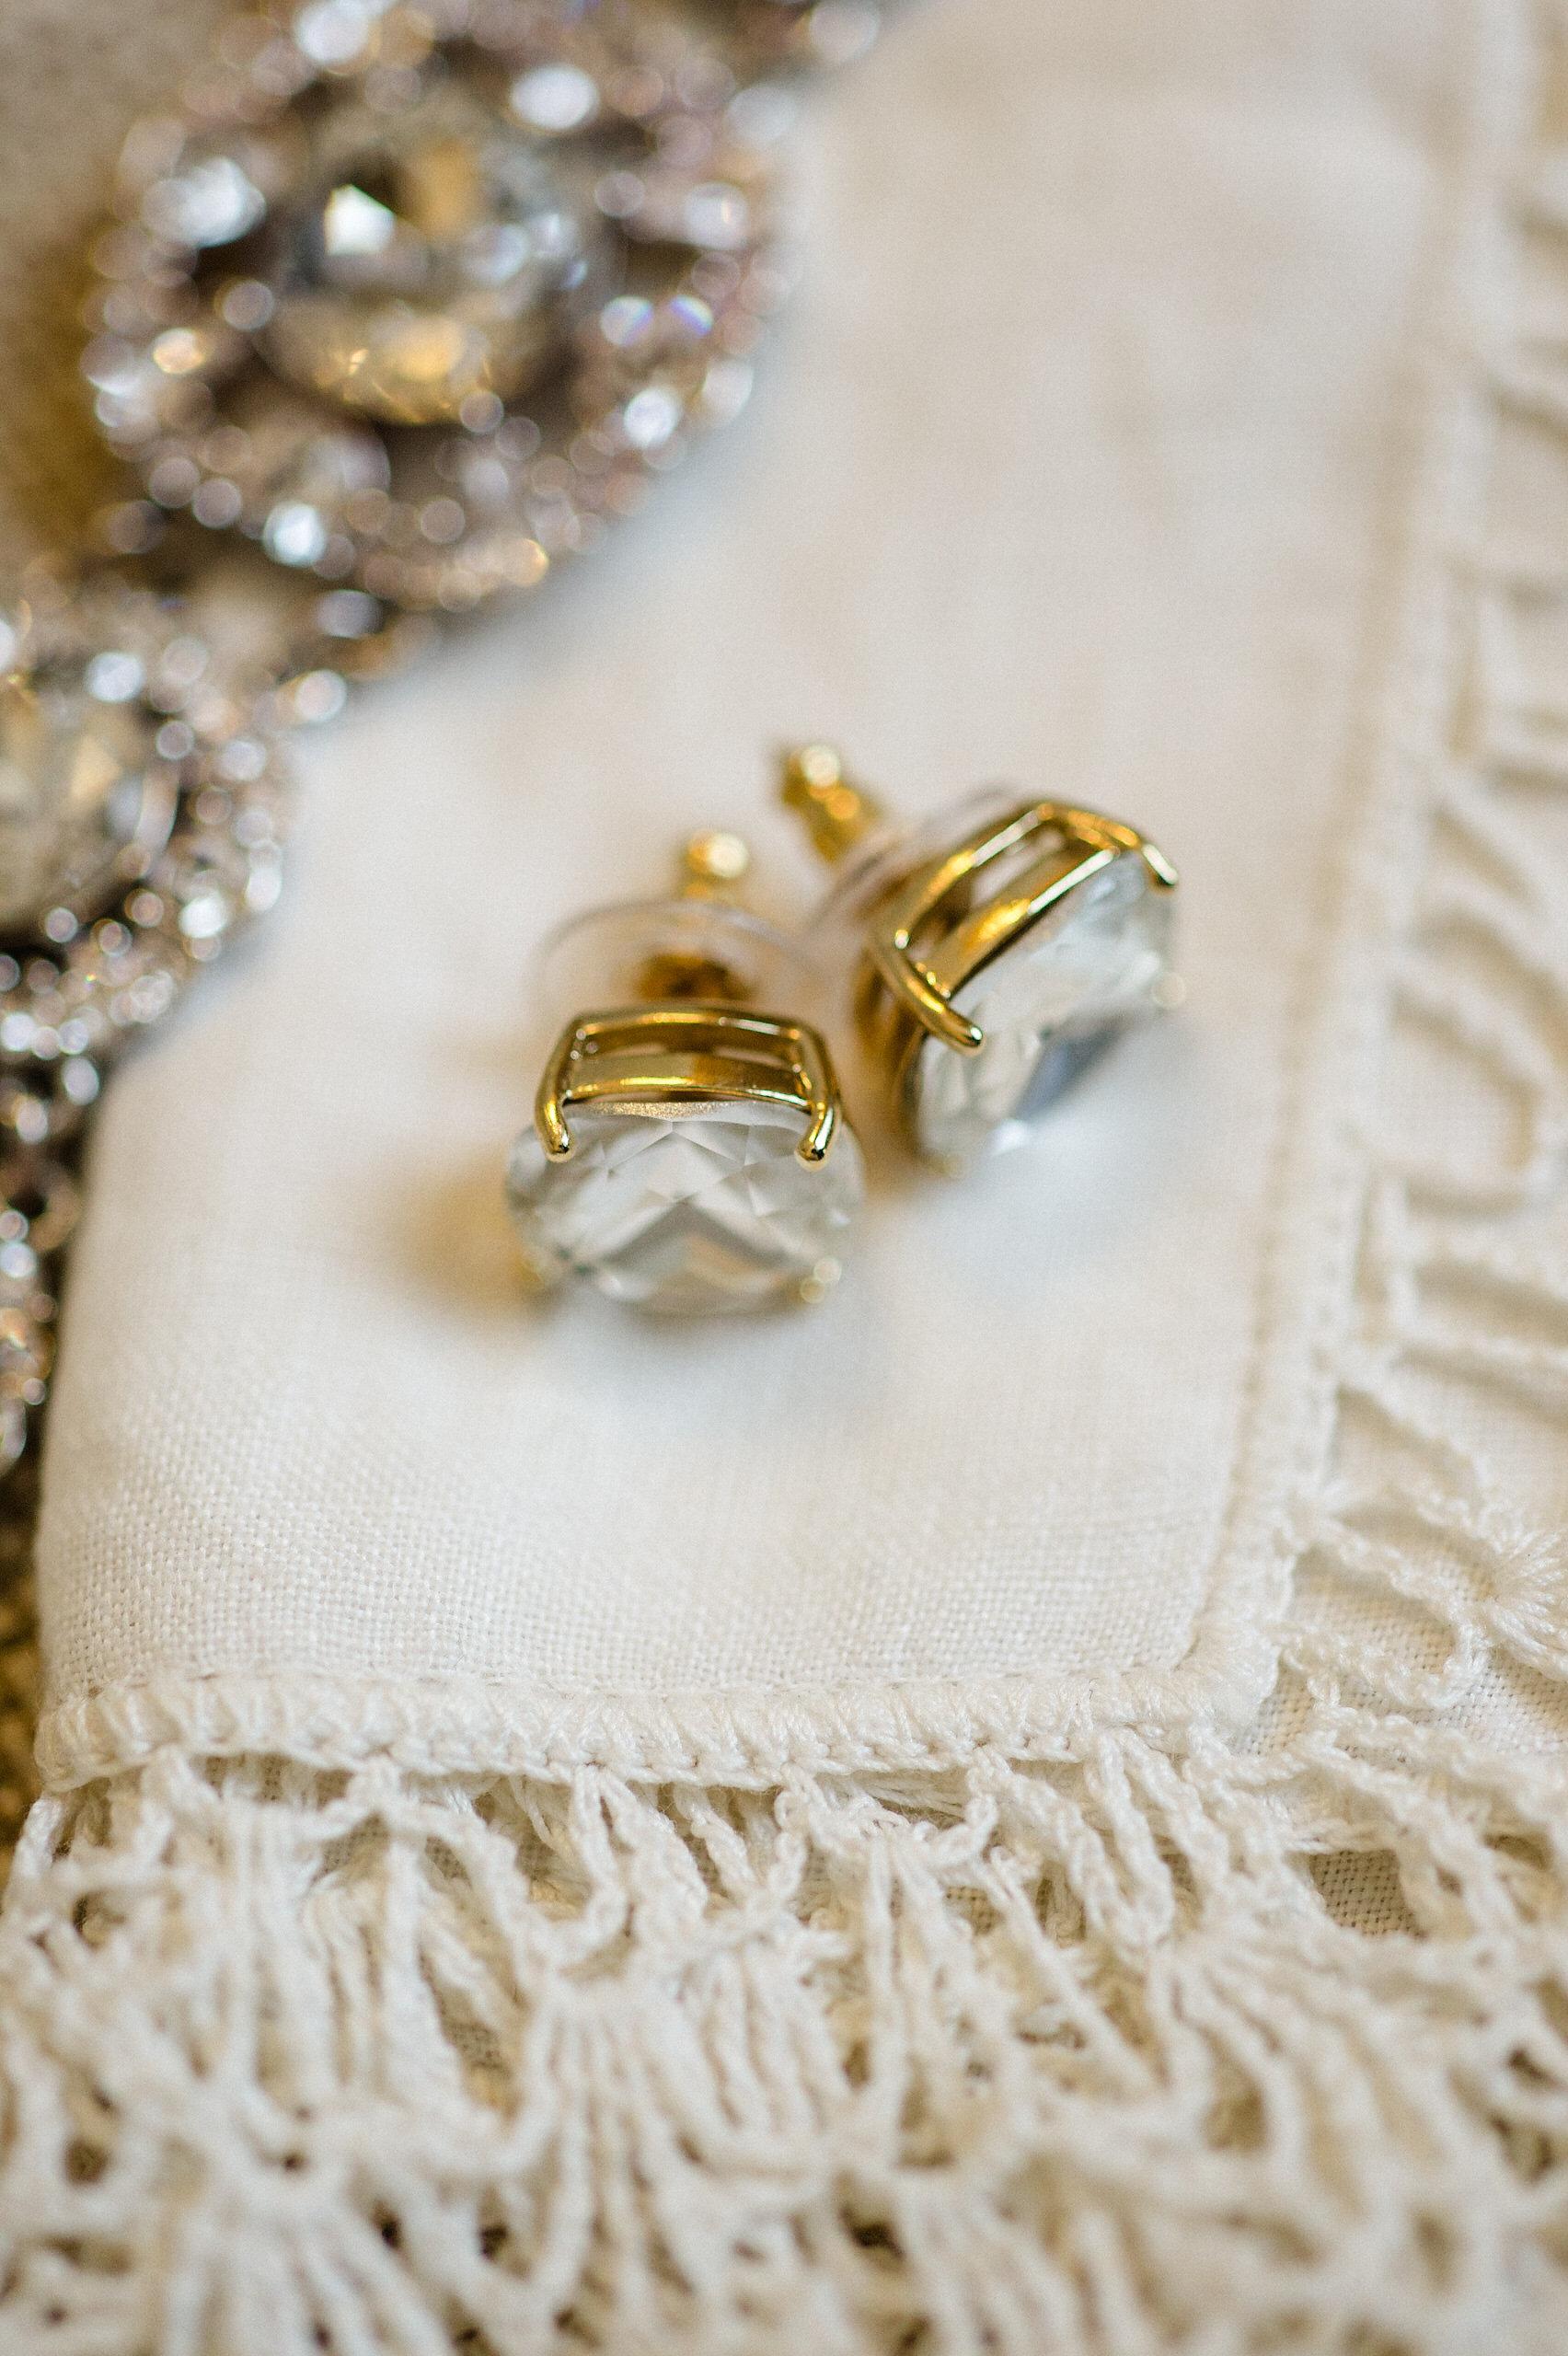 shelby&jordan|smitten&hooked|wedding|details-021.jpg